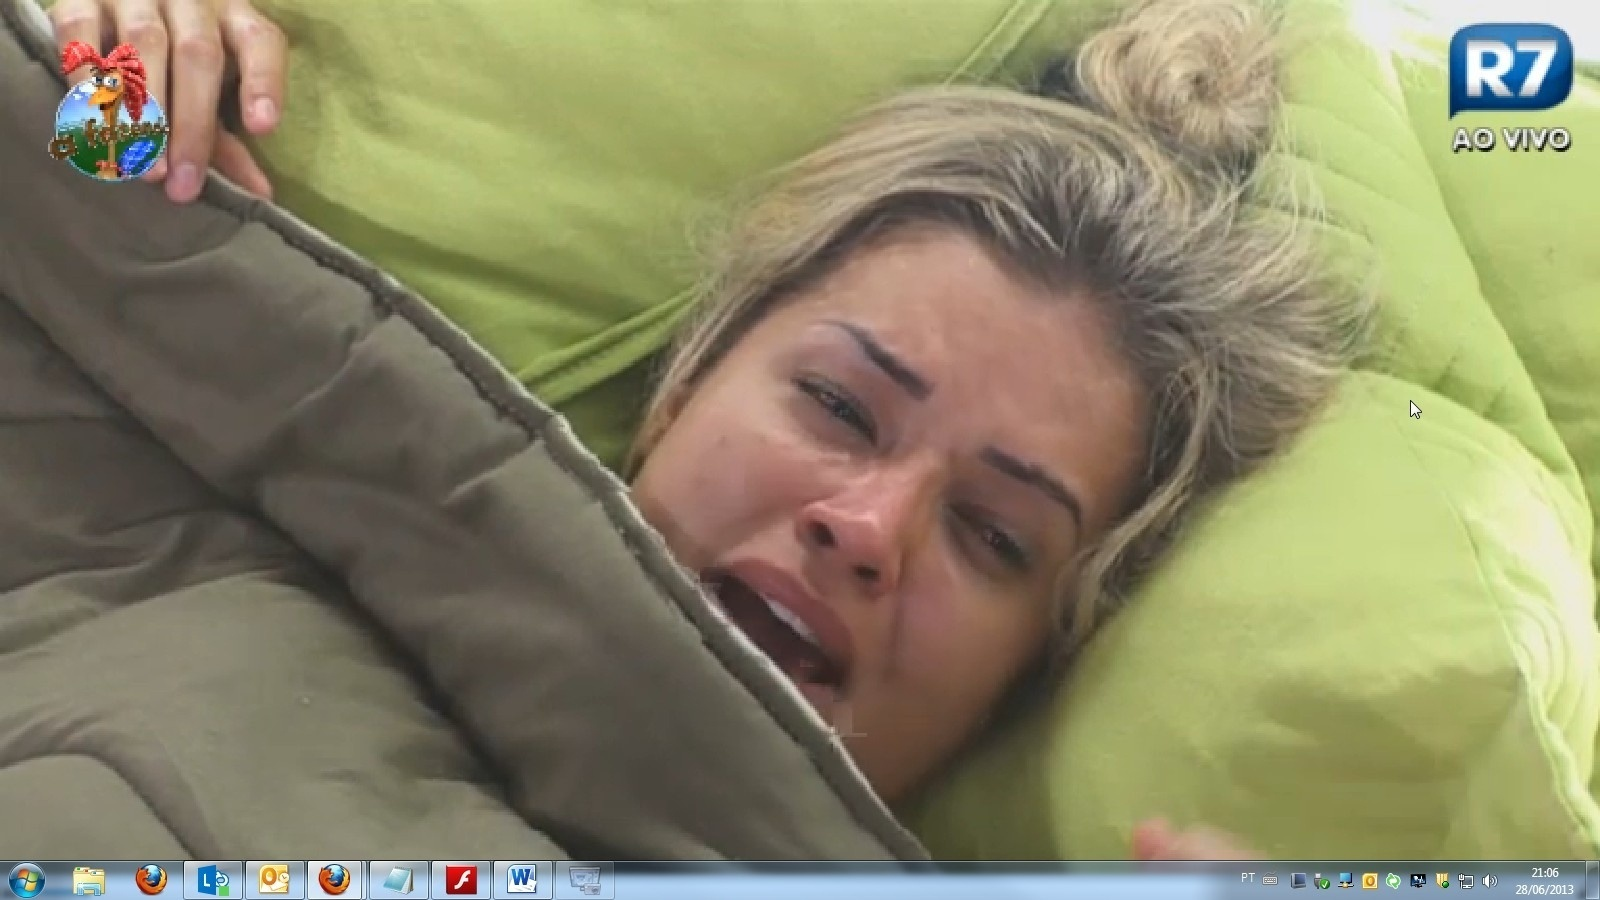 28.jun.2013 - Magoada com brincadeiras de Ivo, Aryane vai para cama chorar